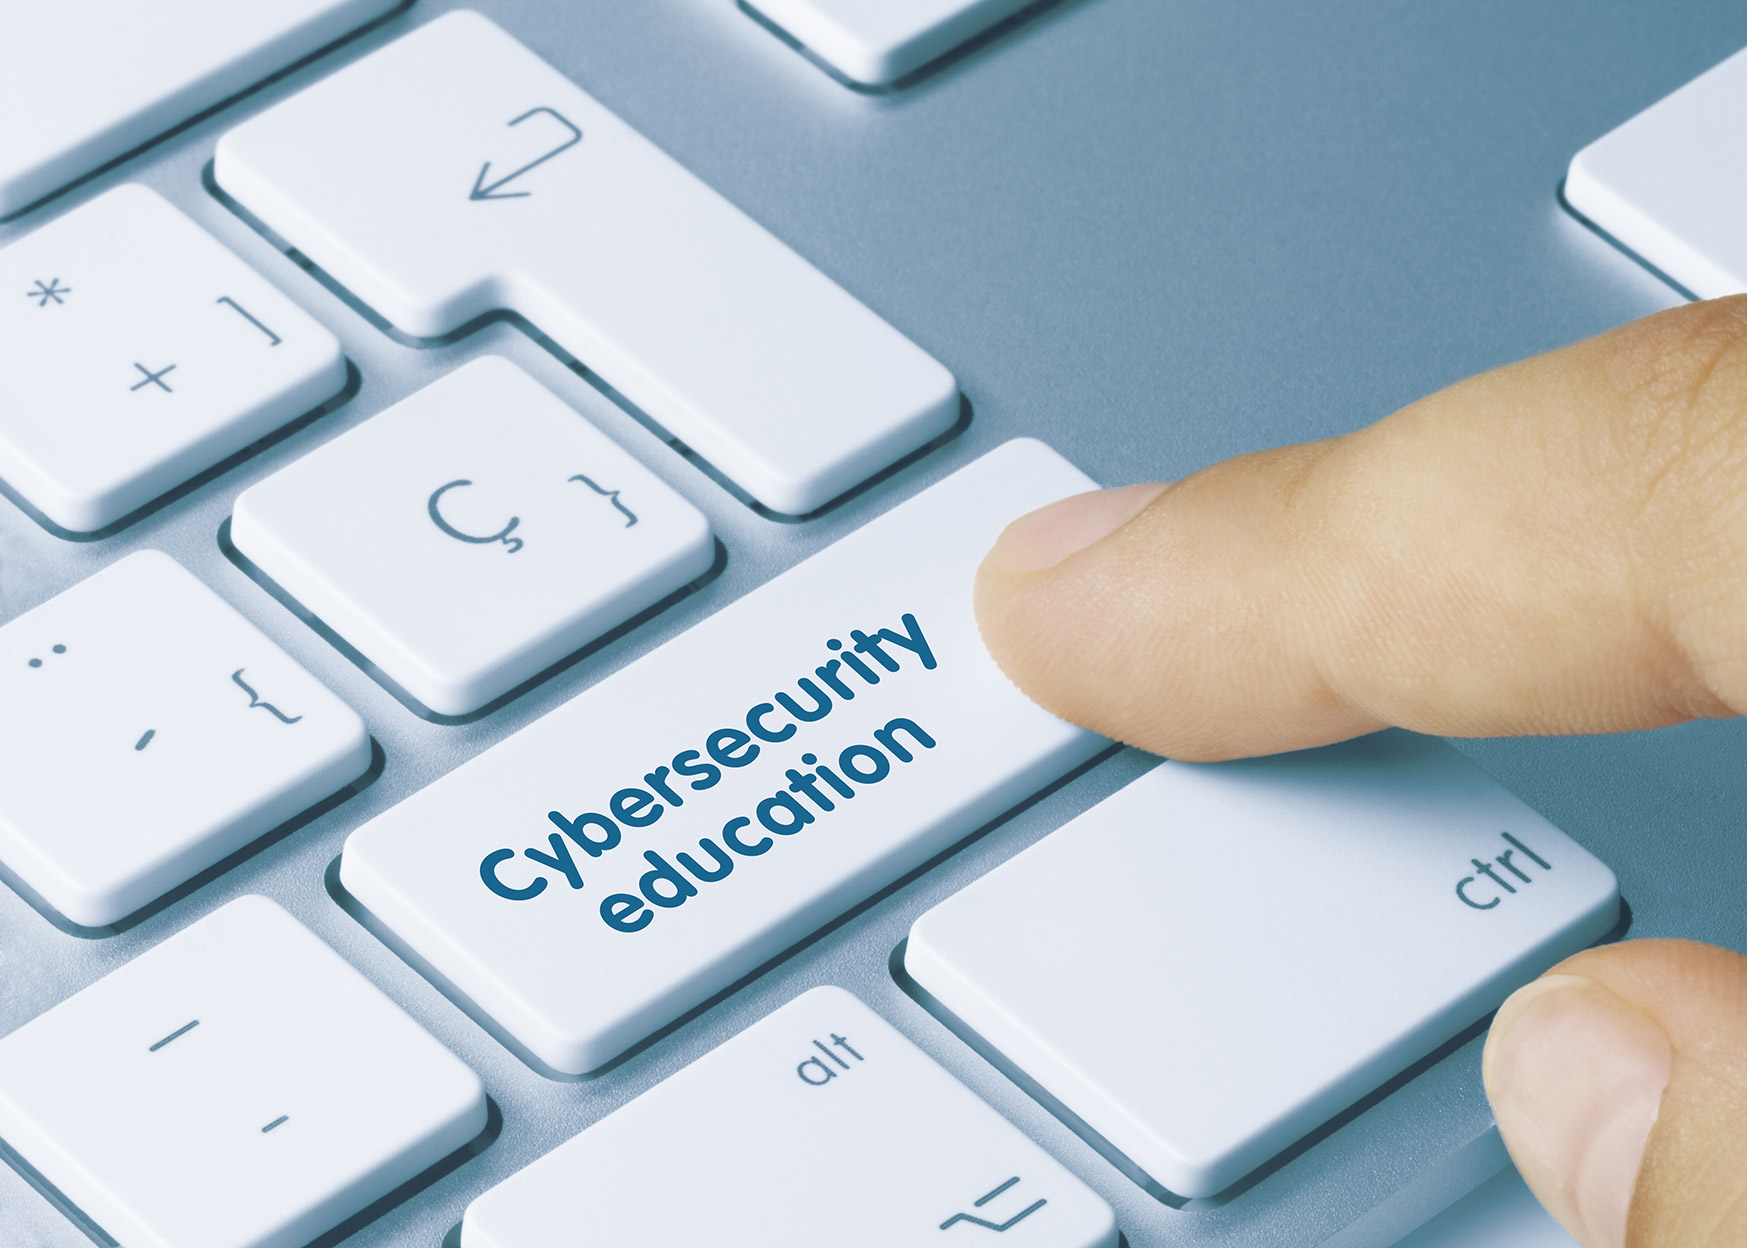 CyberSecurityEducation.jpg